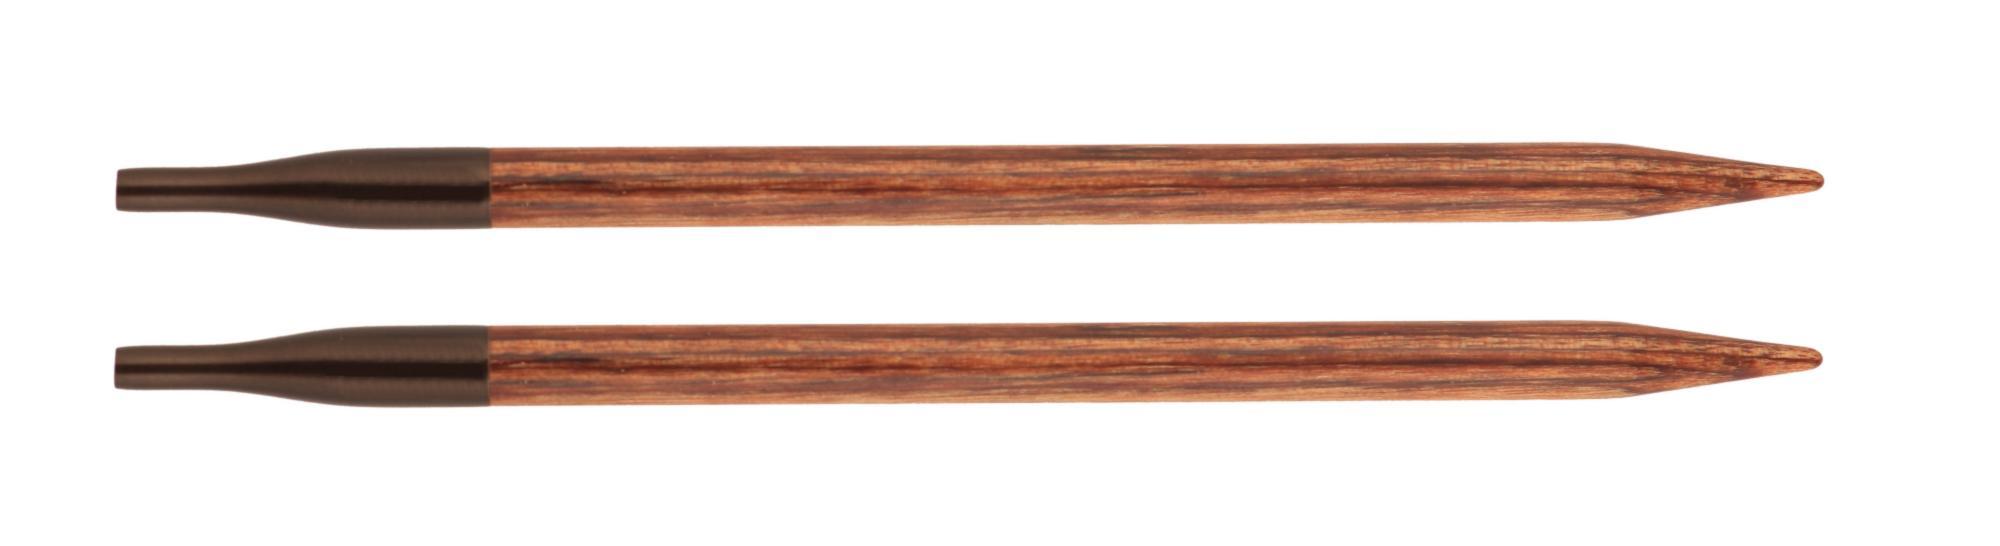 31235 Спицы съемные короткие 12.00 мм Ginger KnitPro